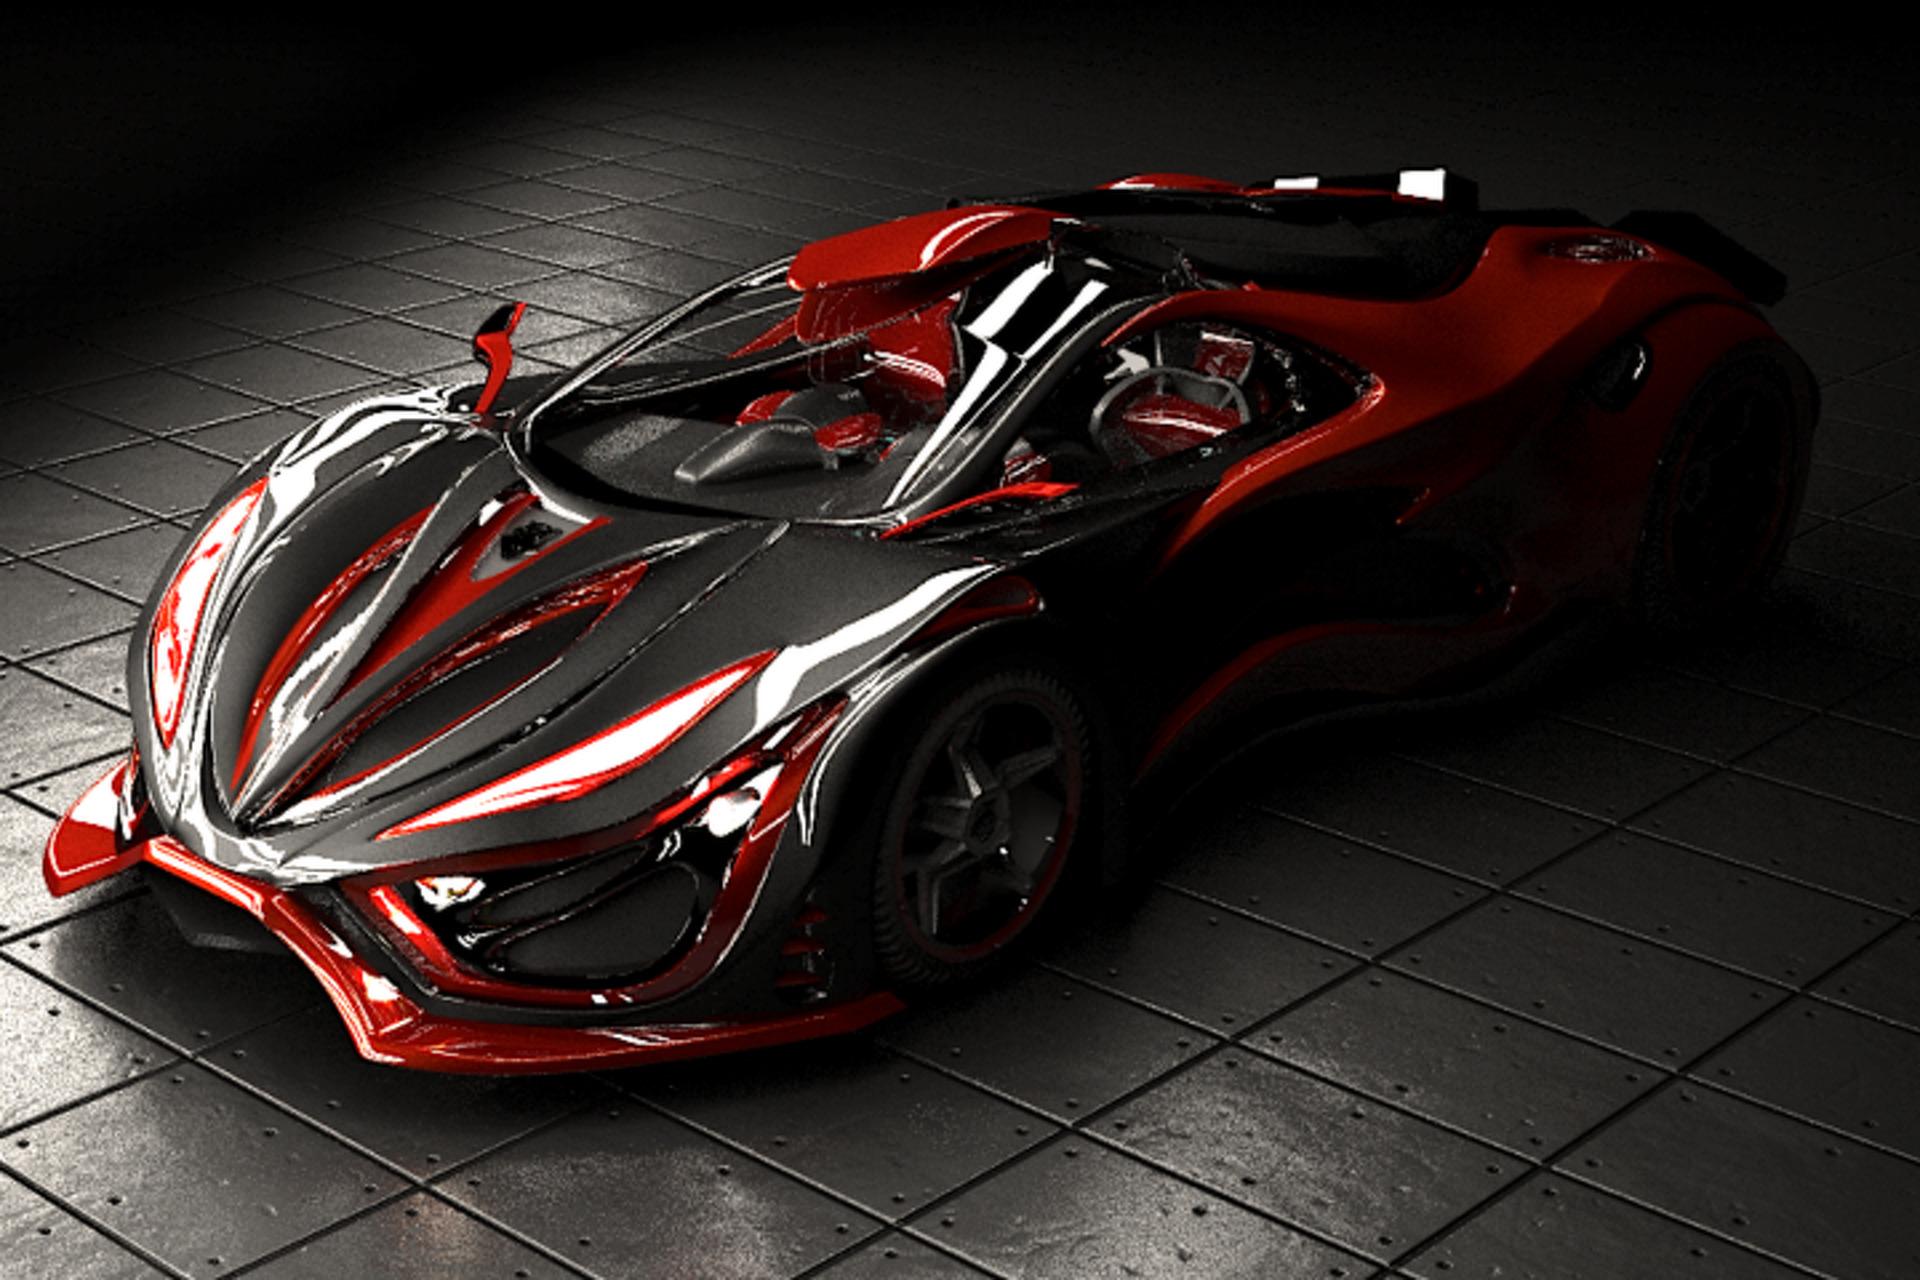 Inferno Exotic Car 2017 >> Inferno Exotic Car Is A Silly Fake Supercar Motor1 Com Photos